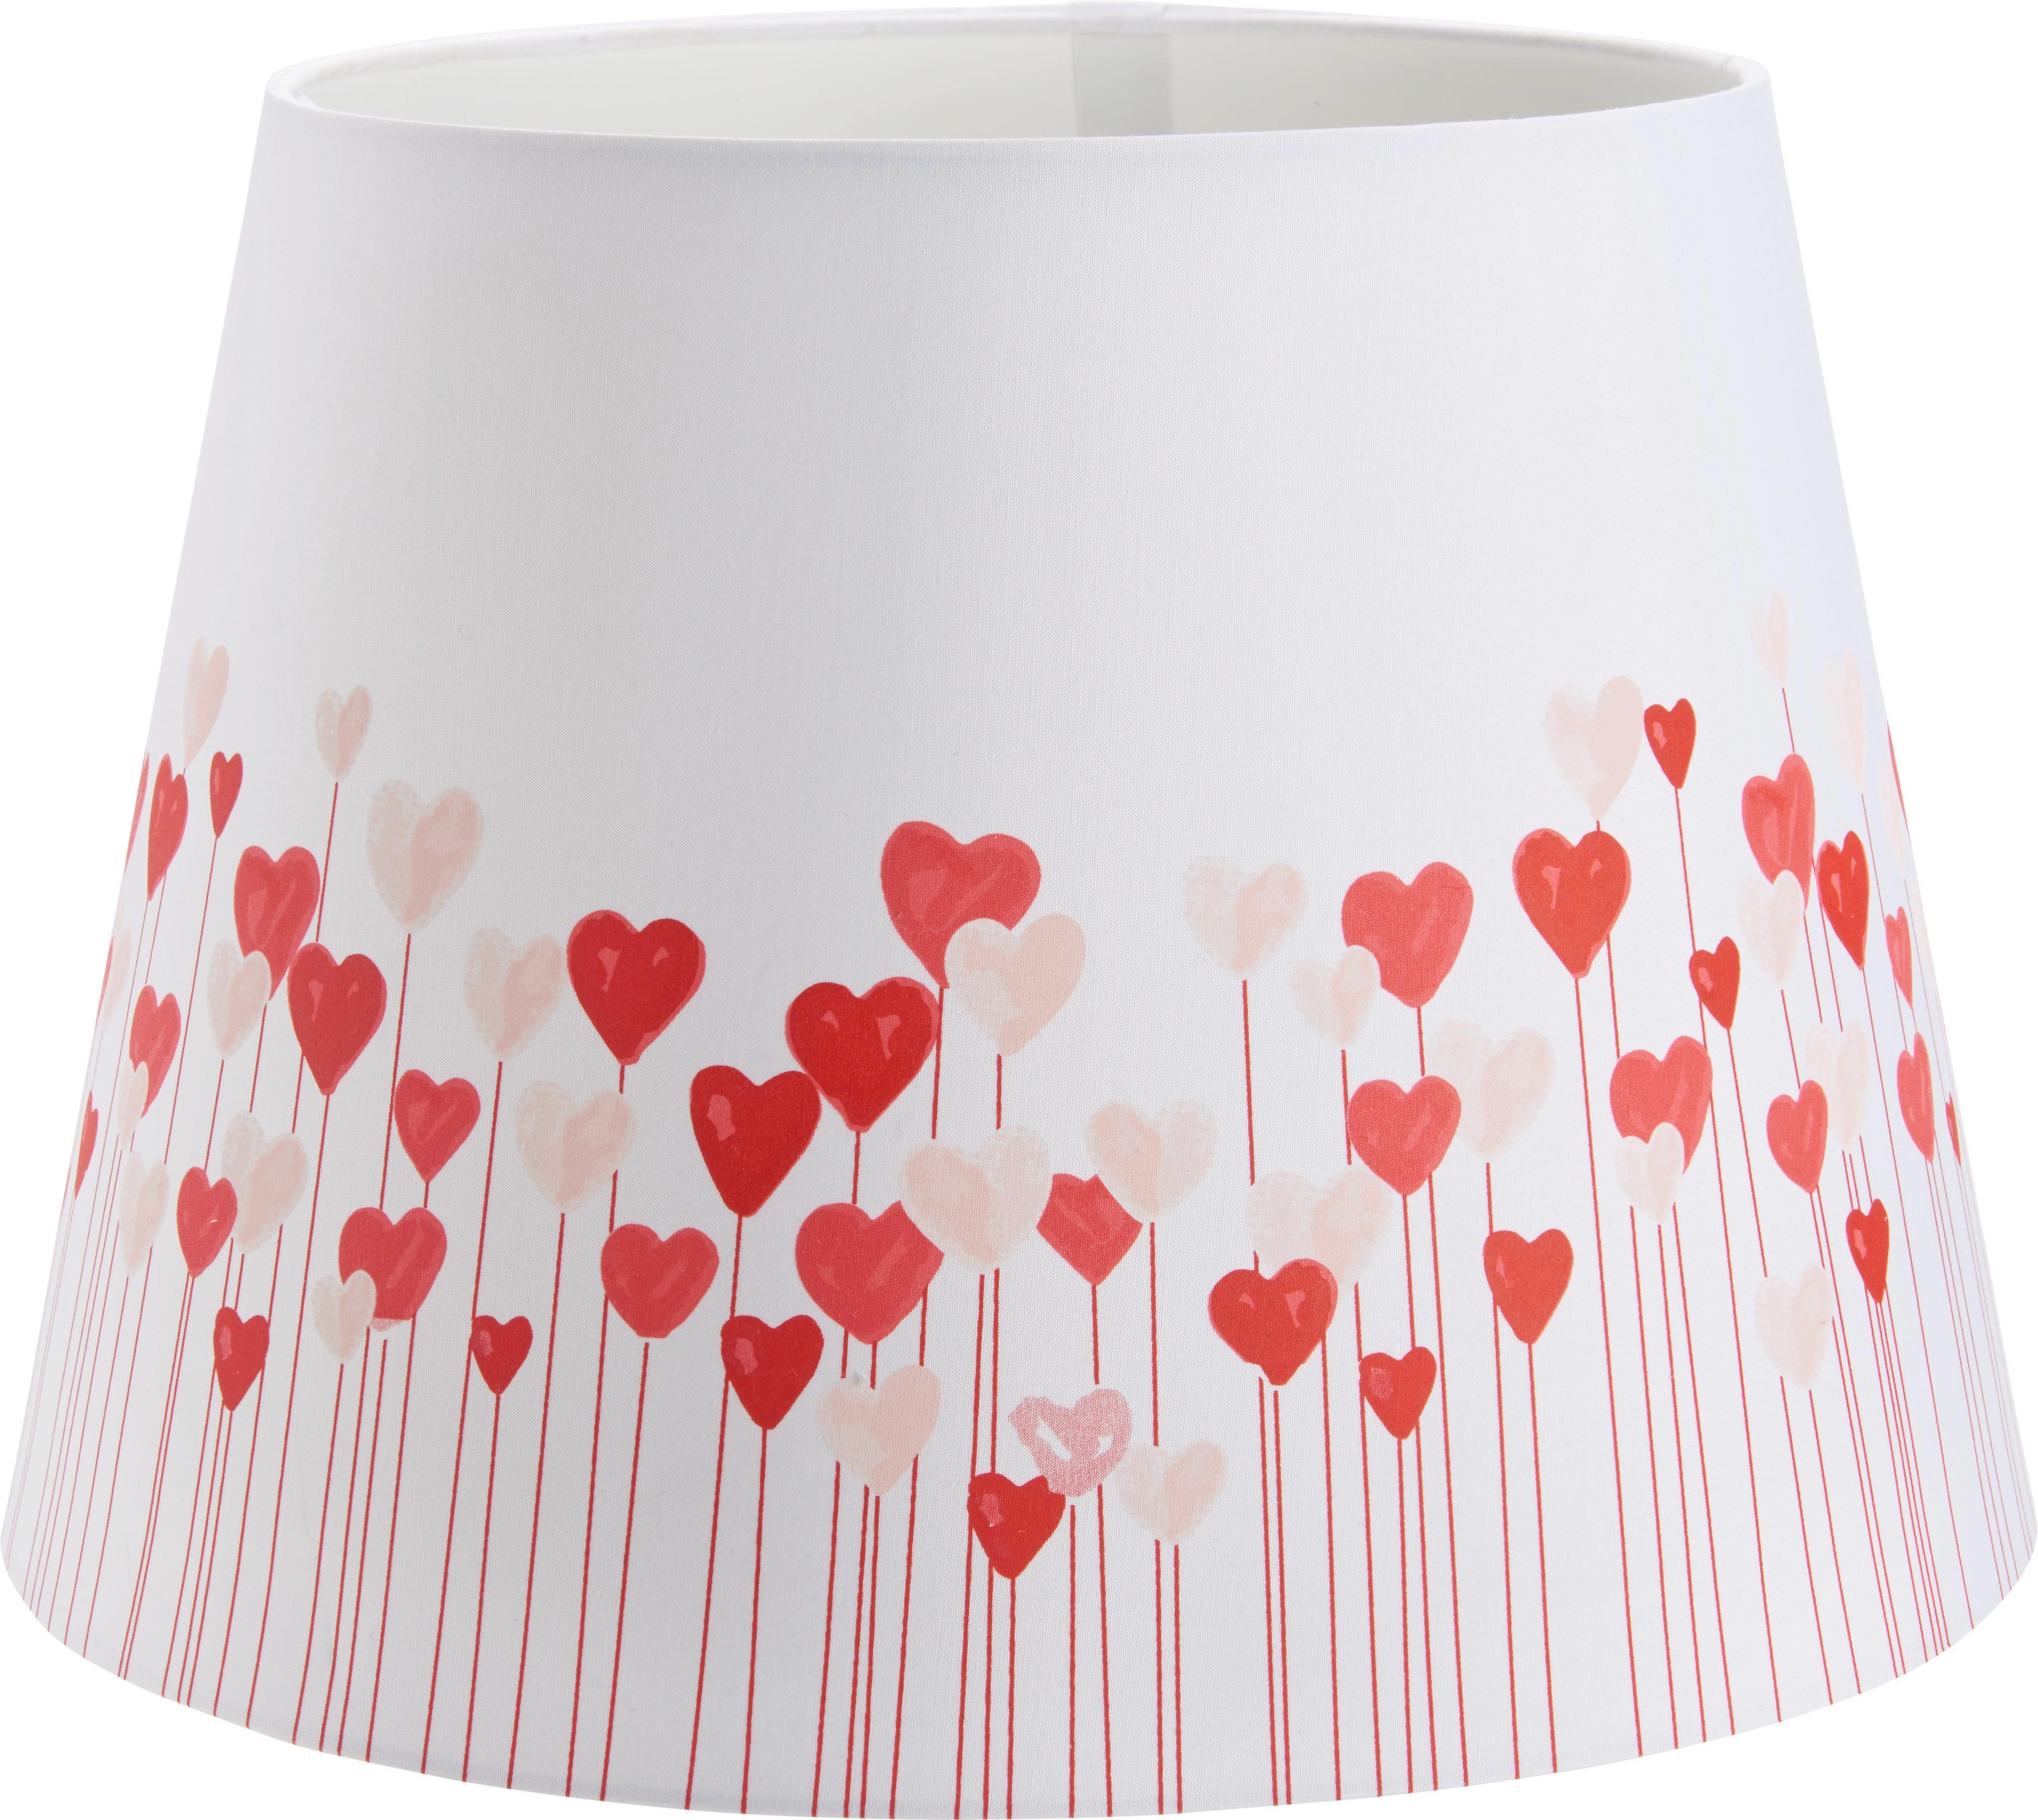 Leuchtenschirm Lovely in Rot/Weiß - Rot/Weiß, ROMANTIK / LANDHAUS, Textil/Metall (16,5 -20/15,6cm) - MÖMAX modern living